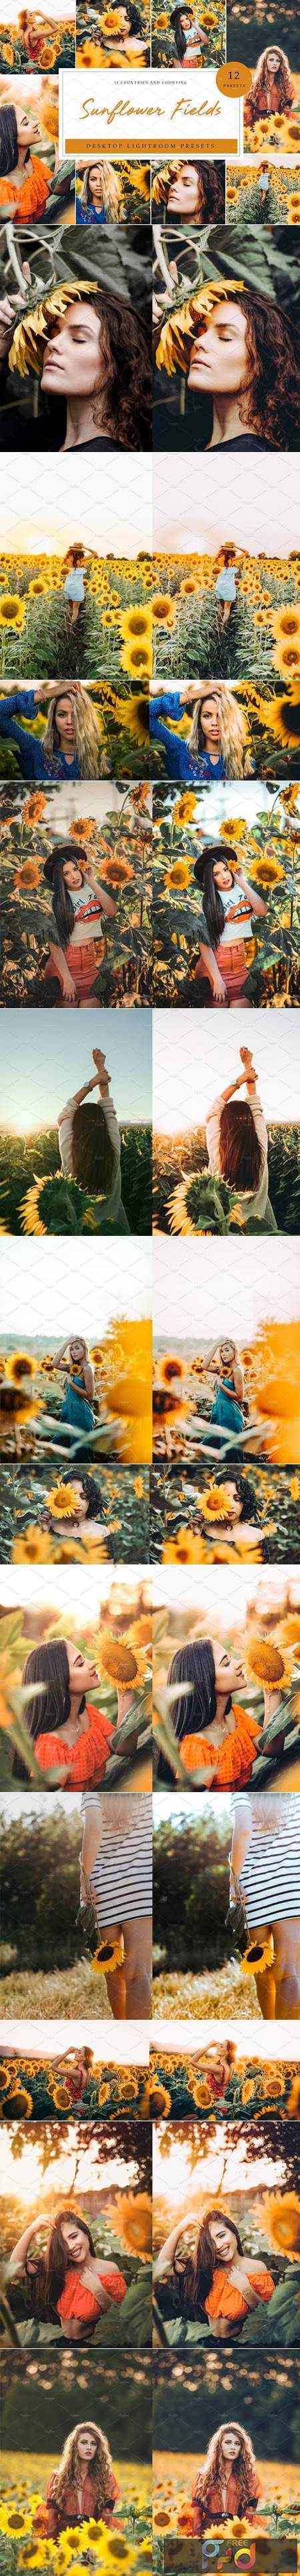 Sunflower Field Presets - Desktop 4792014 1